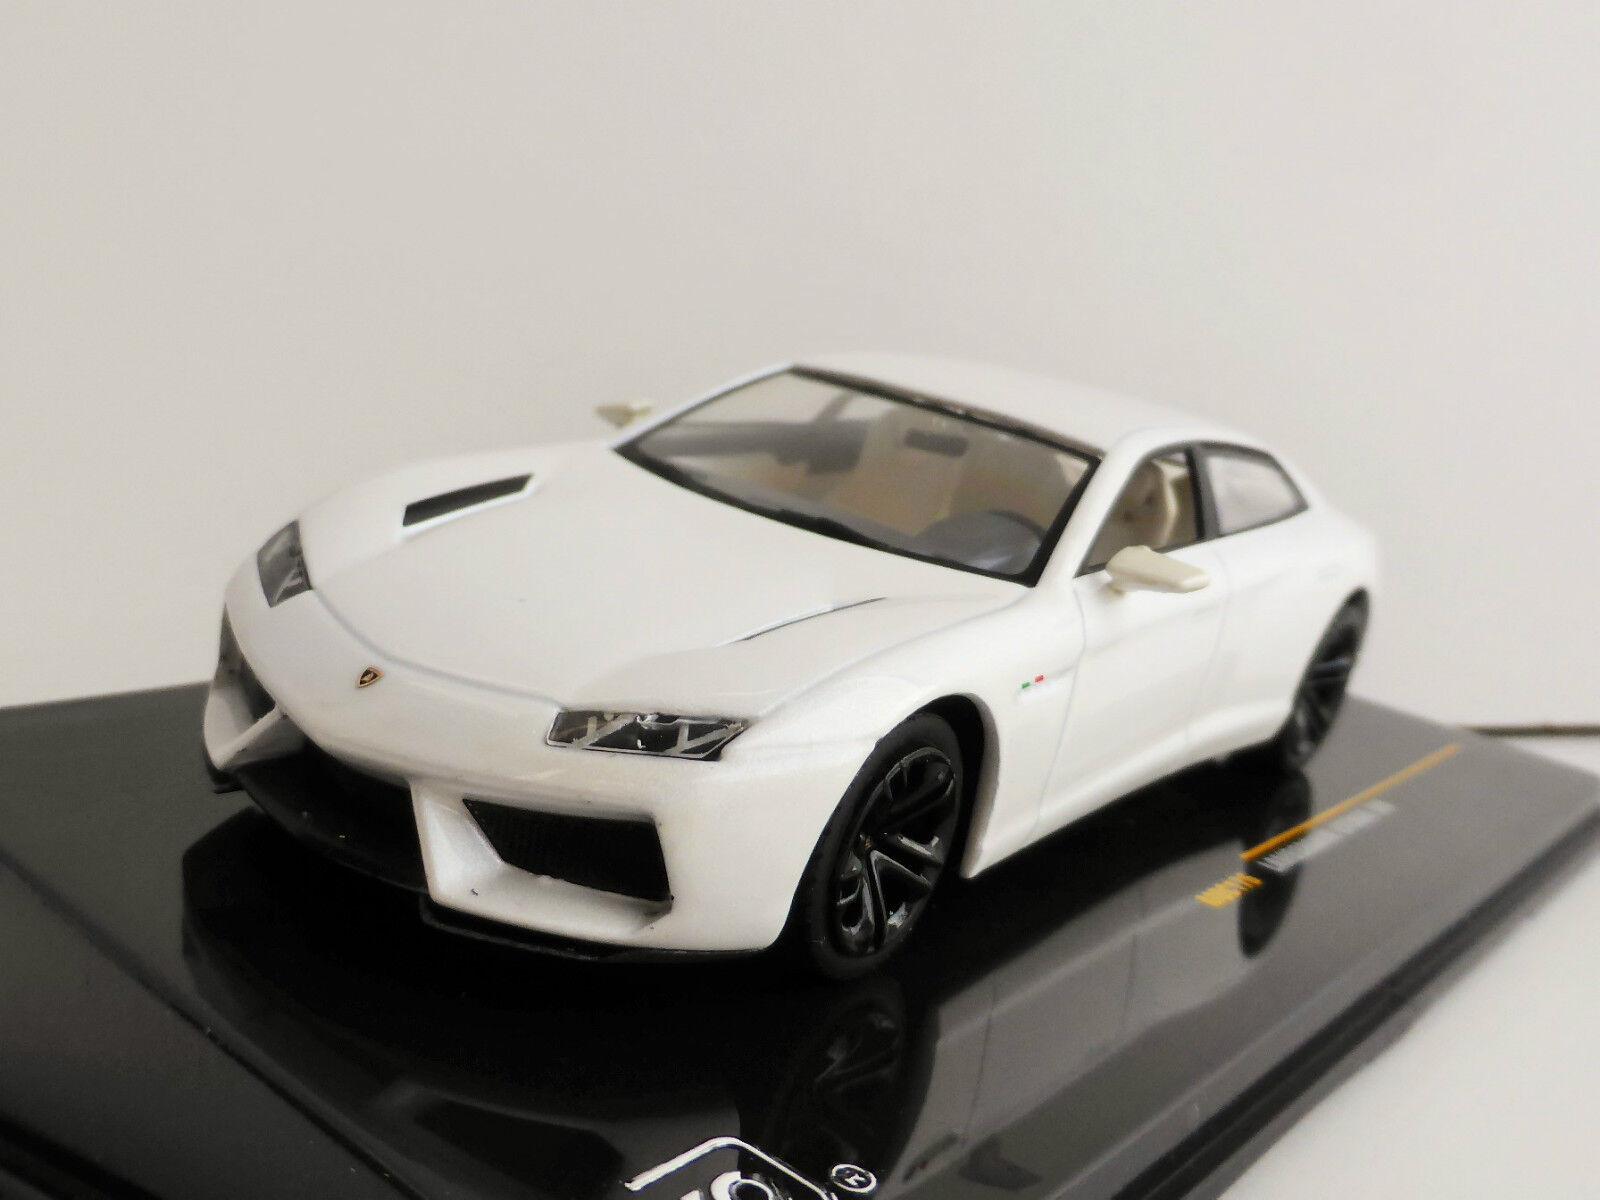 Lamborghini Estoque 200 2008 1 43 IXO moc176 MOC 176 Concept concept